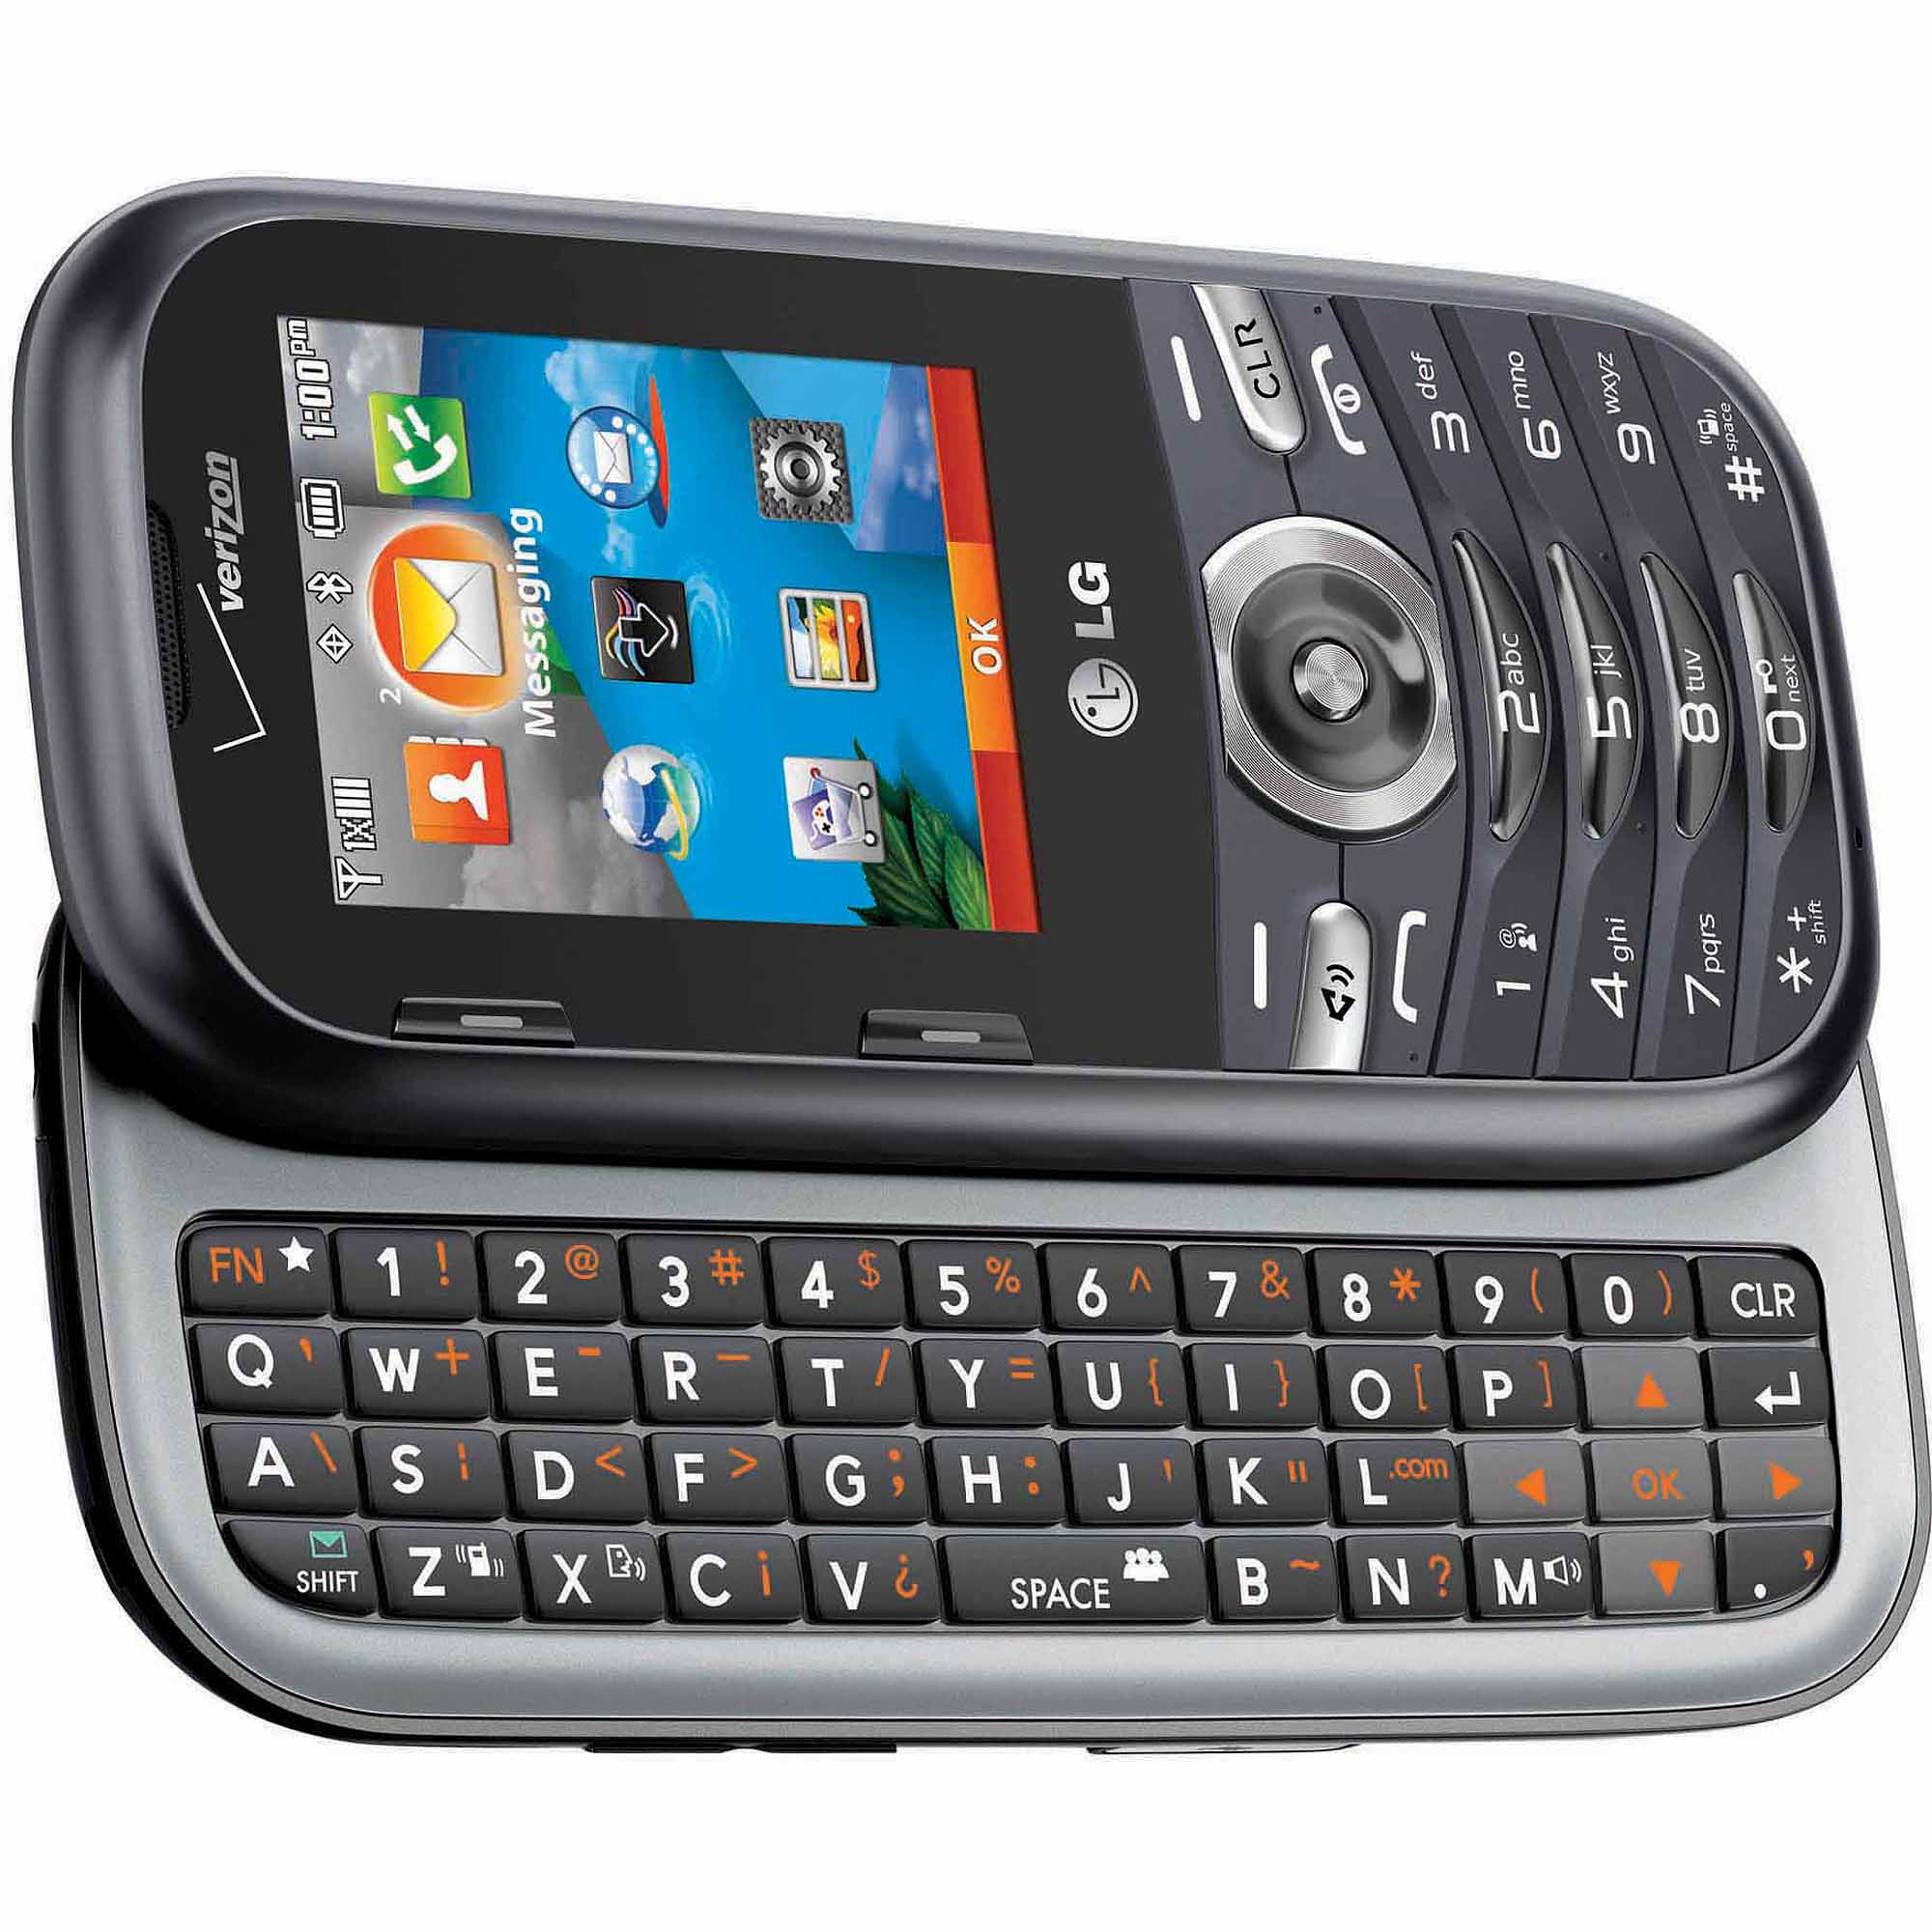 Verizon Prepaid LG Cosmos 3 Cell Phone Walmart